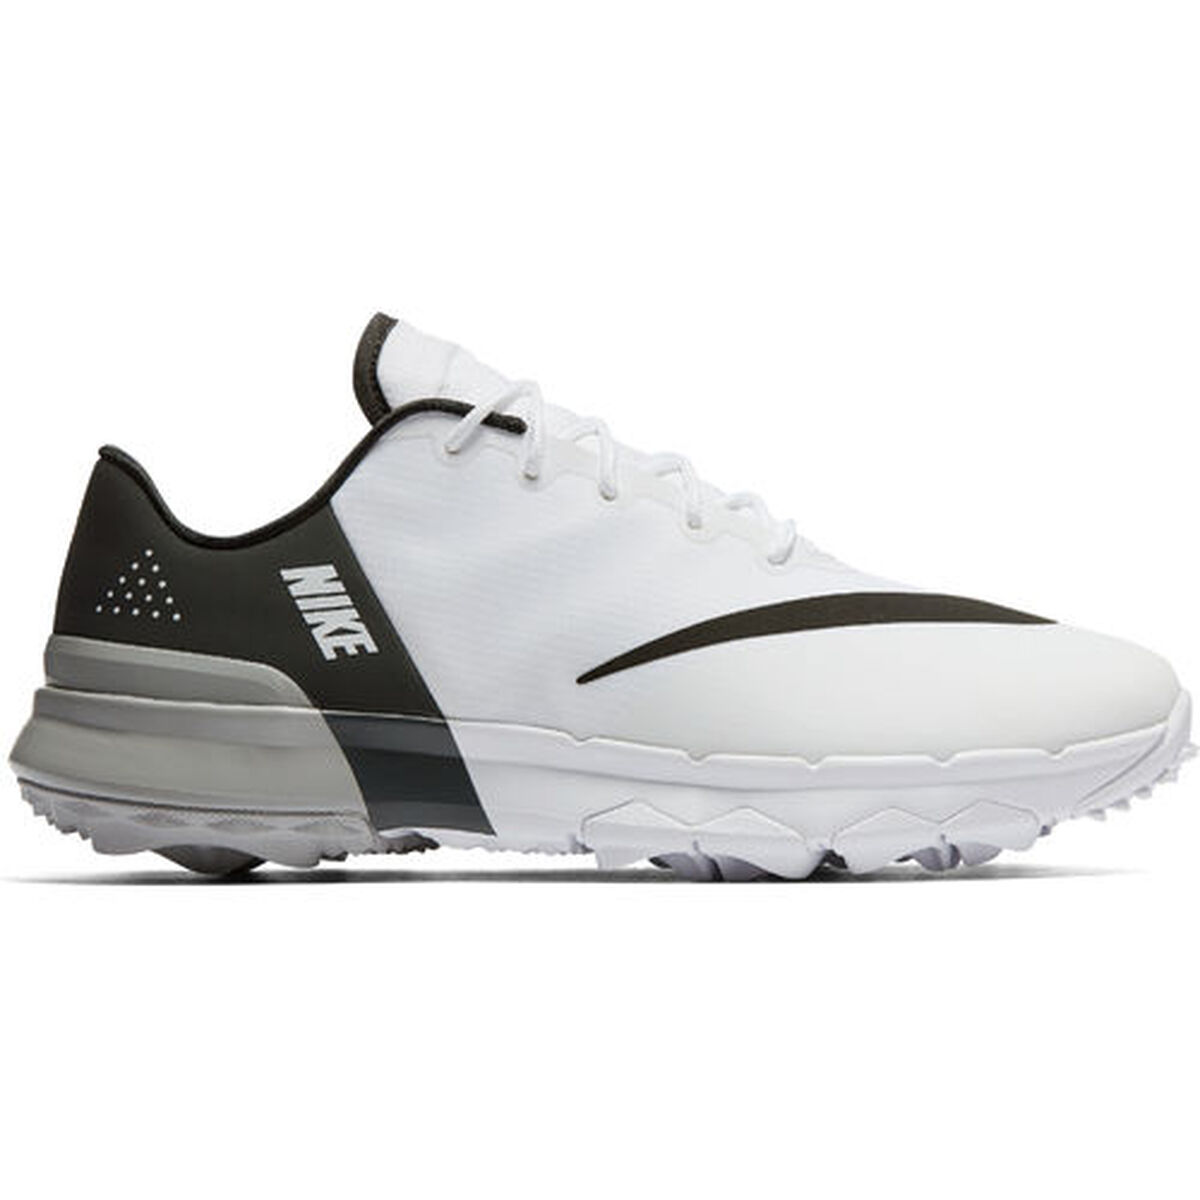 c8ff064ddf82 Images. Nike FI Flex Women  39 s Golf Shoe ...